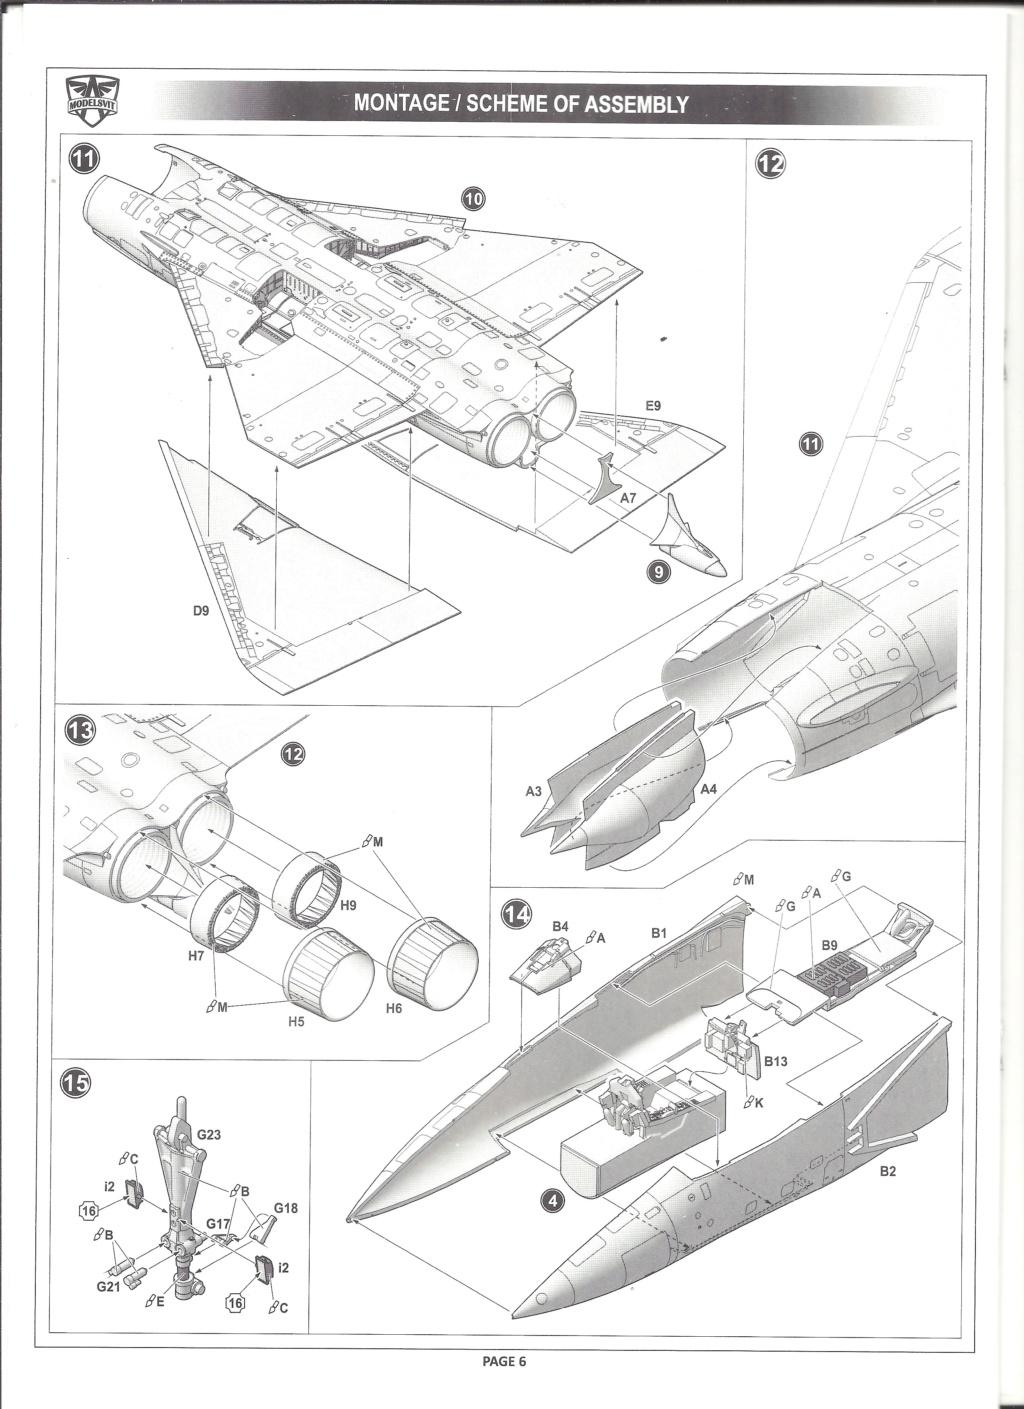 [MODELSVIT] DASSAULT MIRAGE 4000 1/72ème Réf 72052 Notice Models24